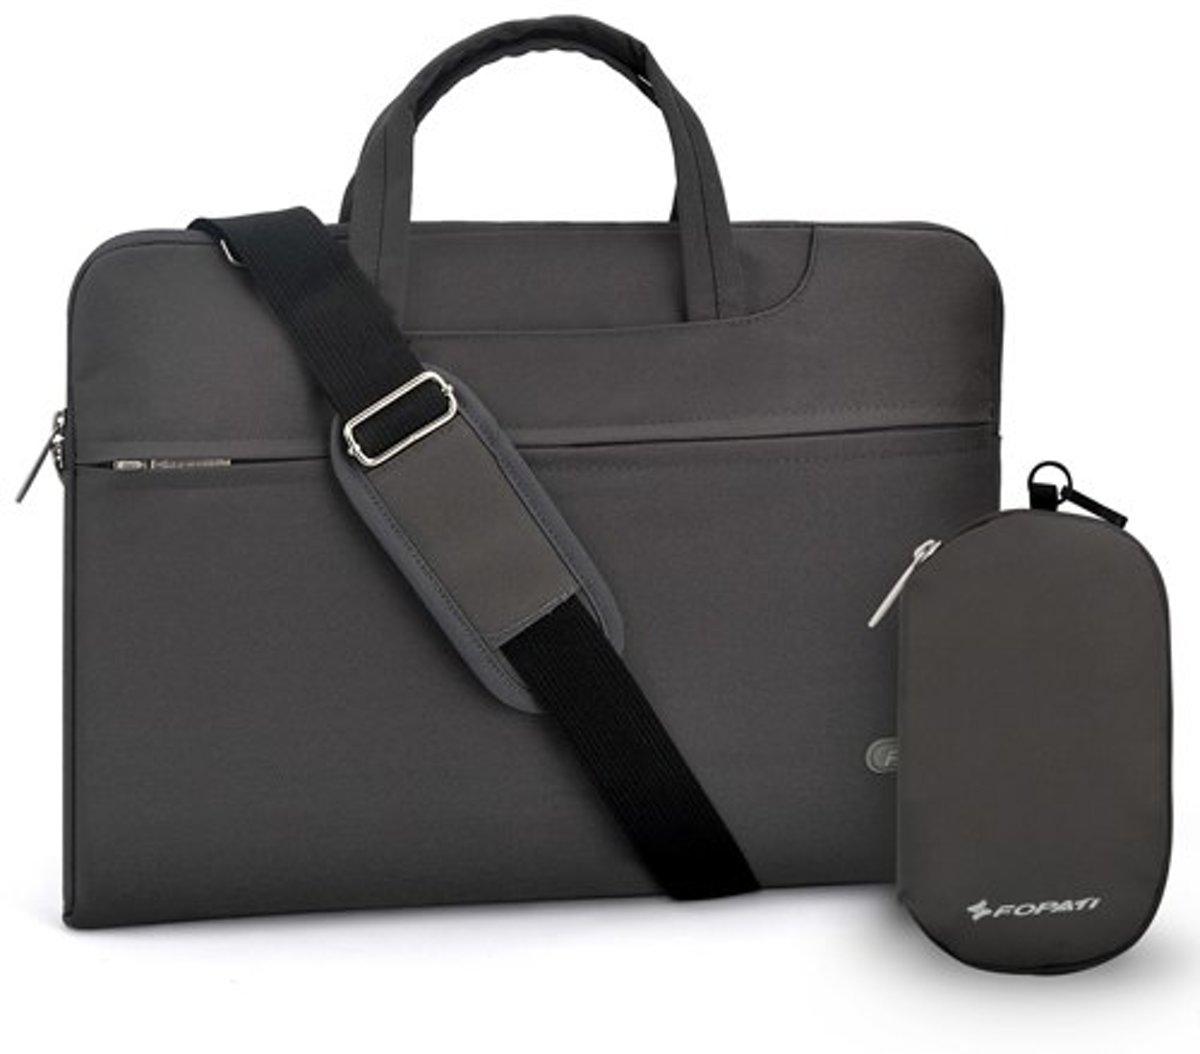 b91feebf55c Luxe Laptophoes met Schouderband en Tasje voor Oplader of Muis | 15 inch |  Grijs